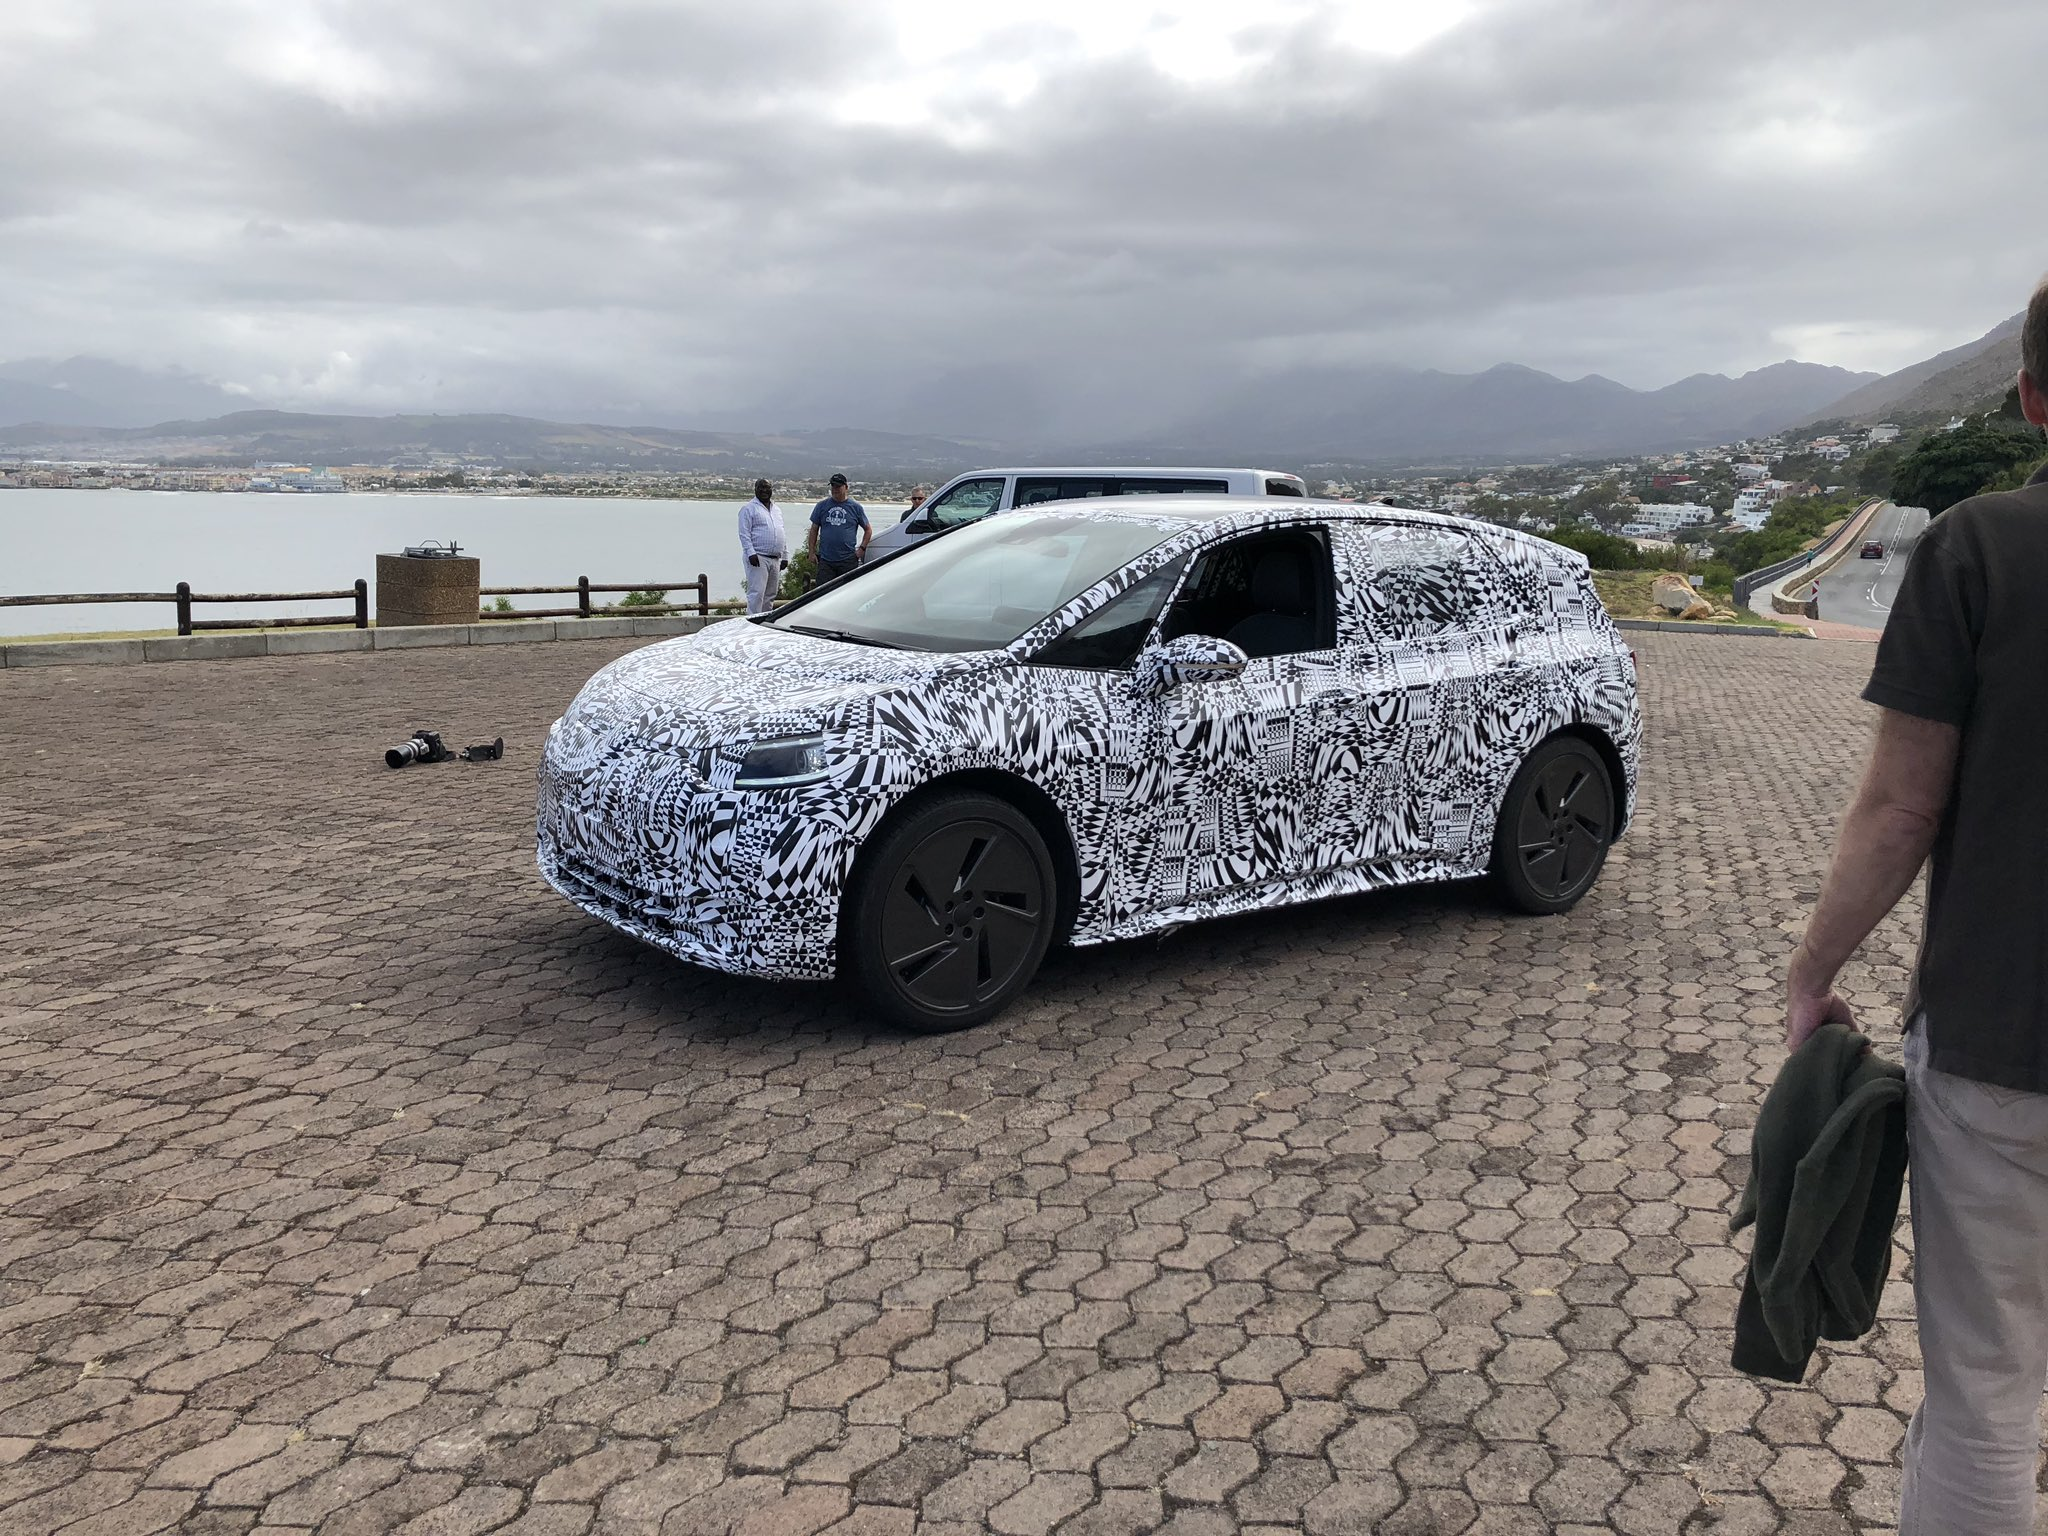 VW ID. Neo Prototyp in Südafrika | FotoCredits @theolitz